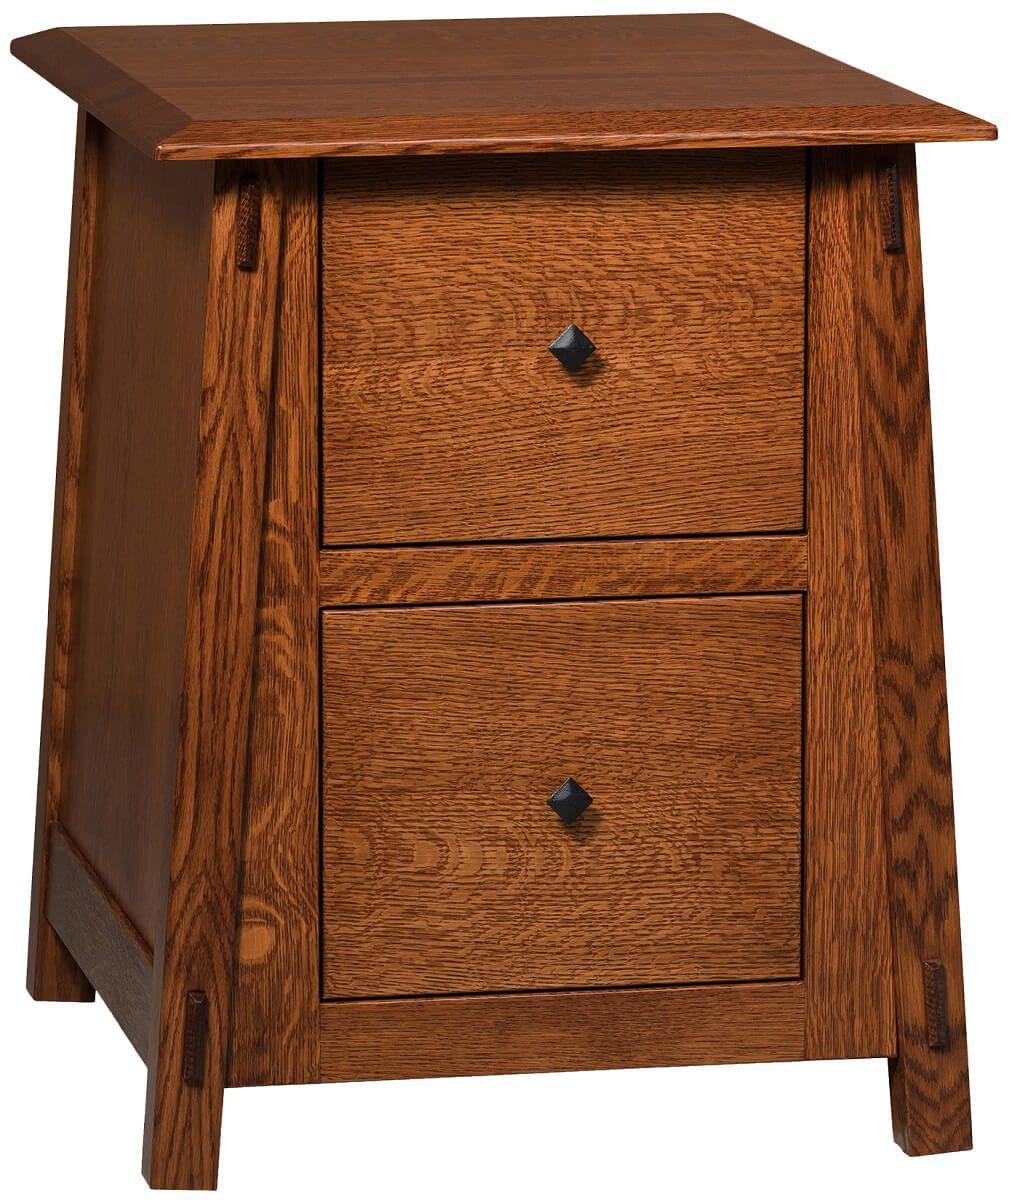 Alaterre File Cabinet